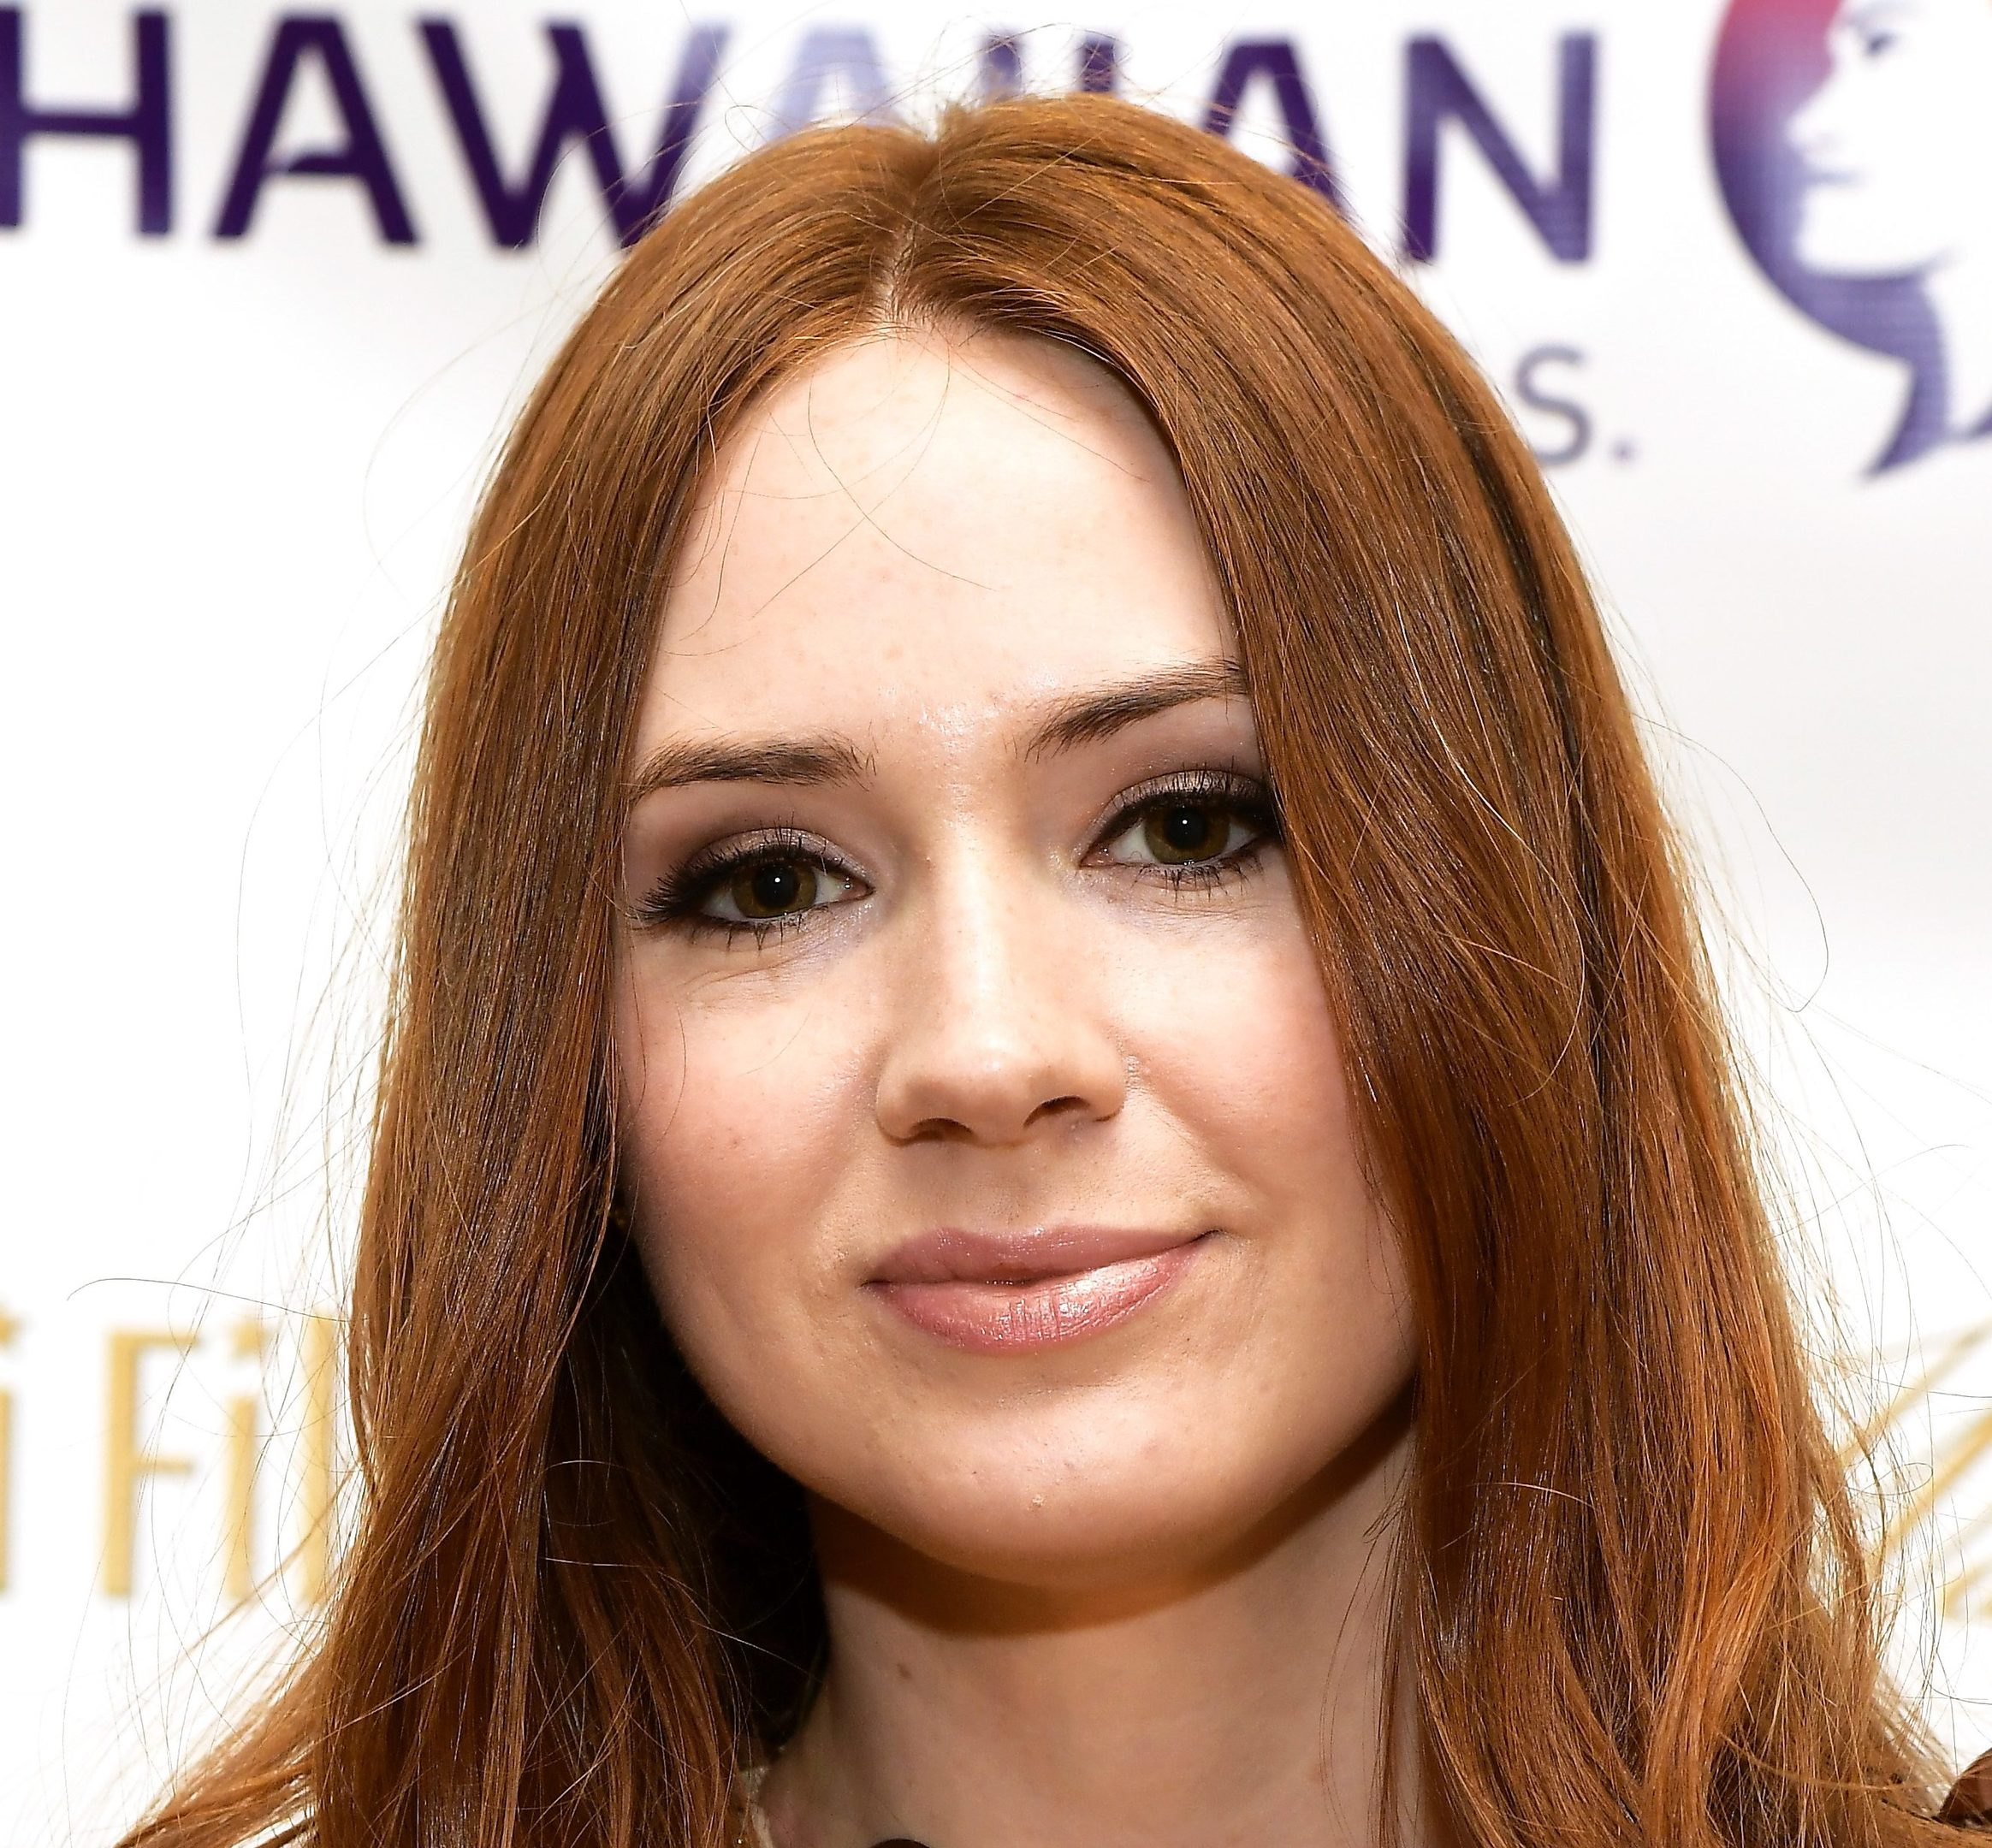 Karen Gillan, who has swapped the Tardis for Hollywood (Matt Winkelmeyer/Getty Images)